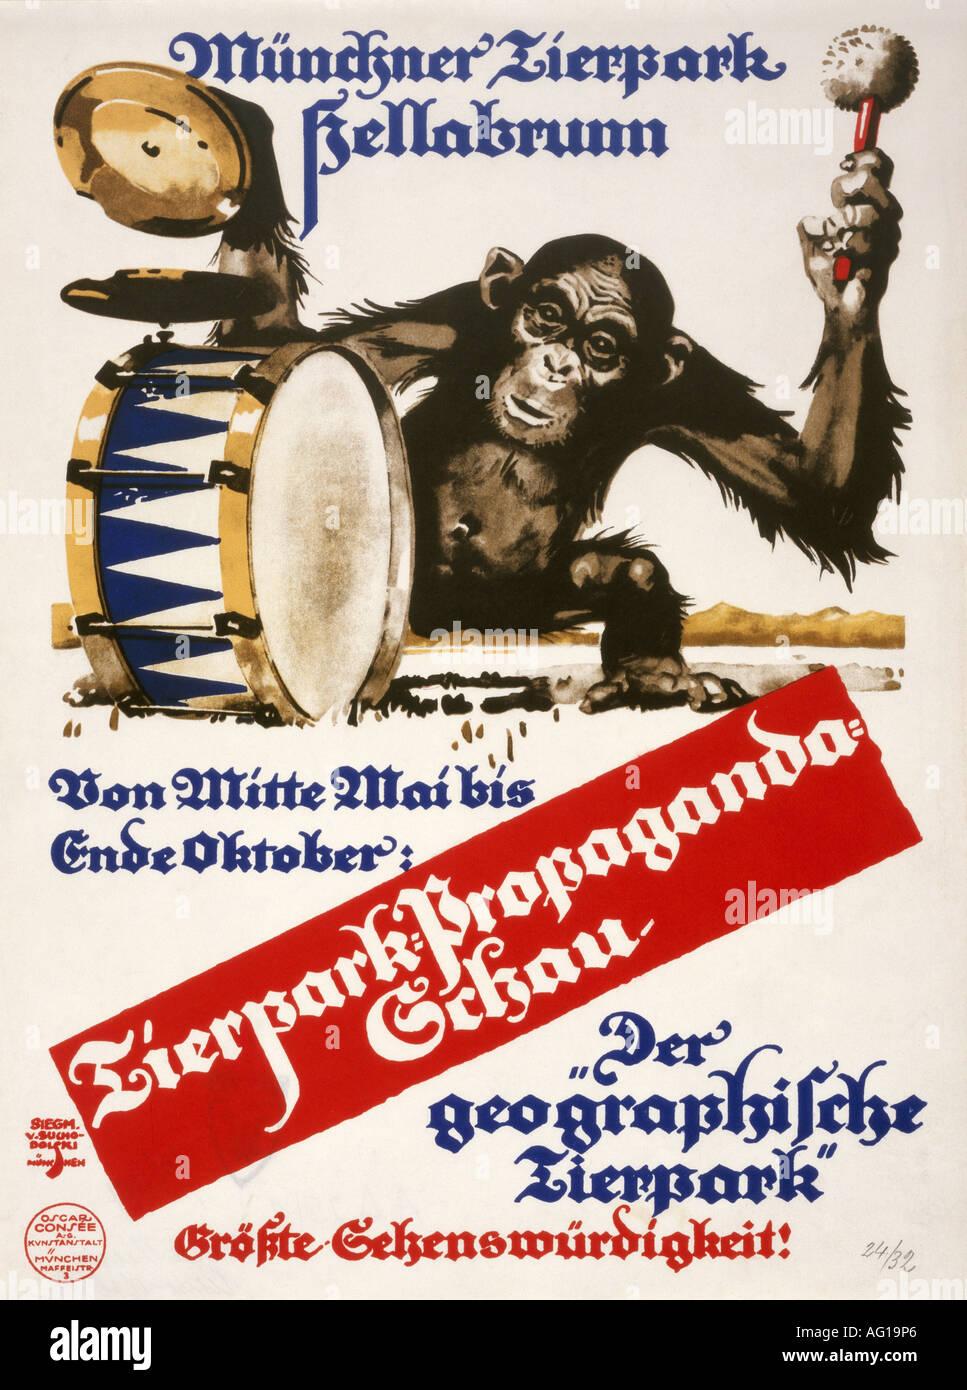 Poster design 1920s - Poster Design 1920s Stock Photo Advertising Tourism M Nchner Tierpark Hellabrunn Munich 1920s 20s Poster